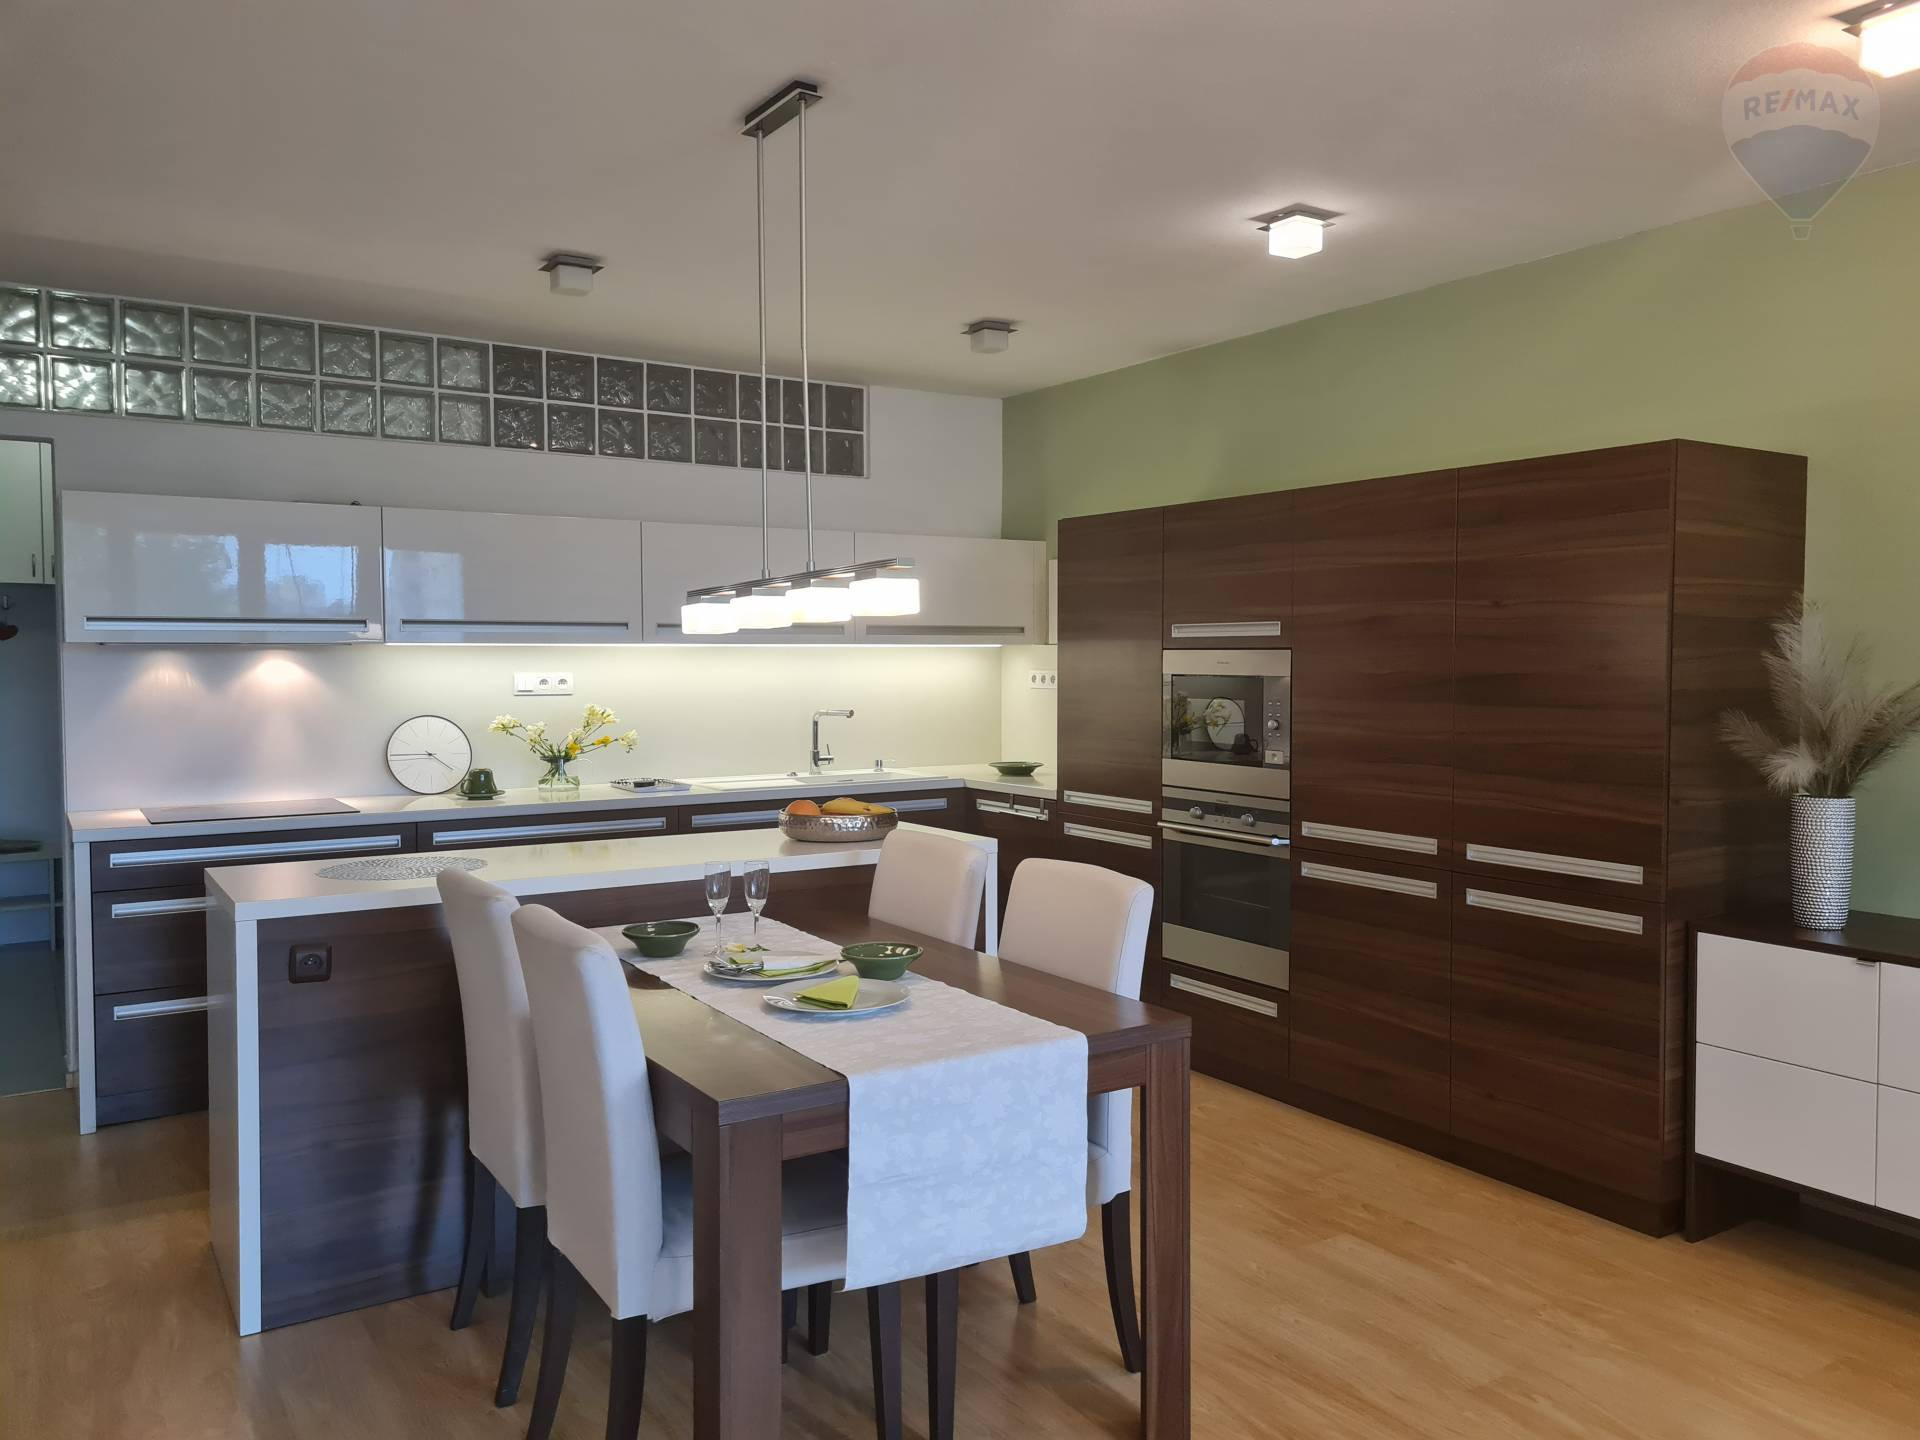 Predaj bytu (4 izbový) 147 m2, Bratislava - Dúbravka -